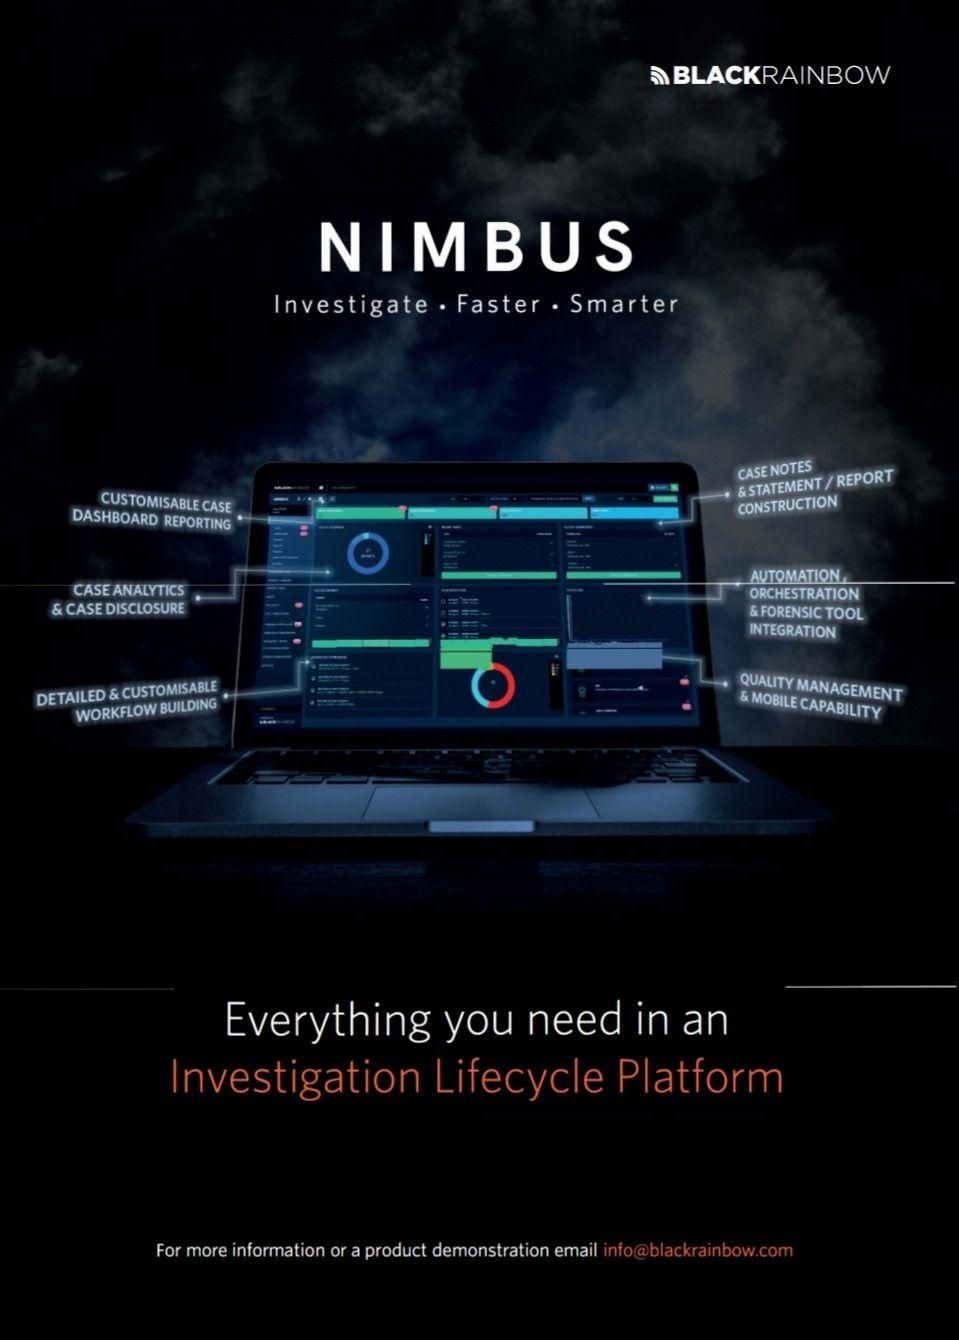 BlackRainbow NIMBUS Overview